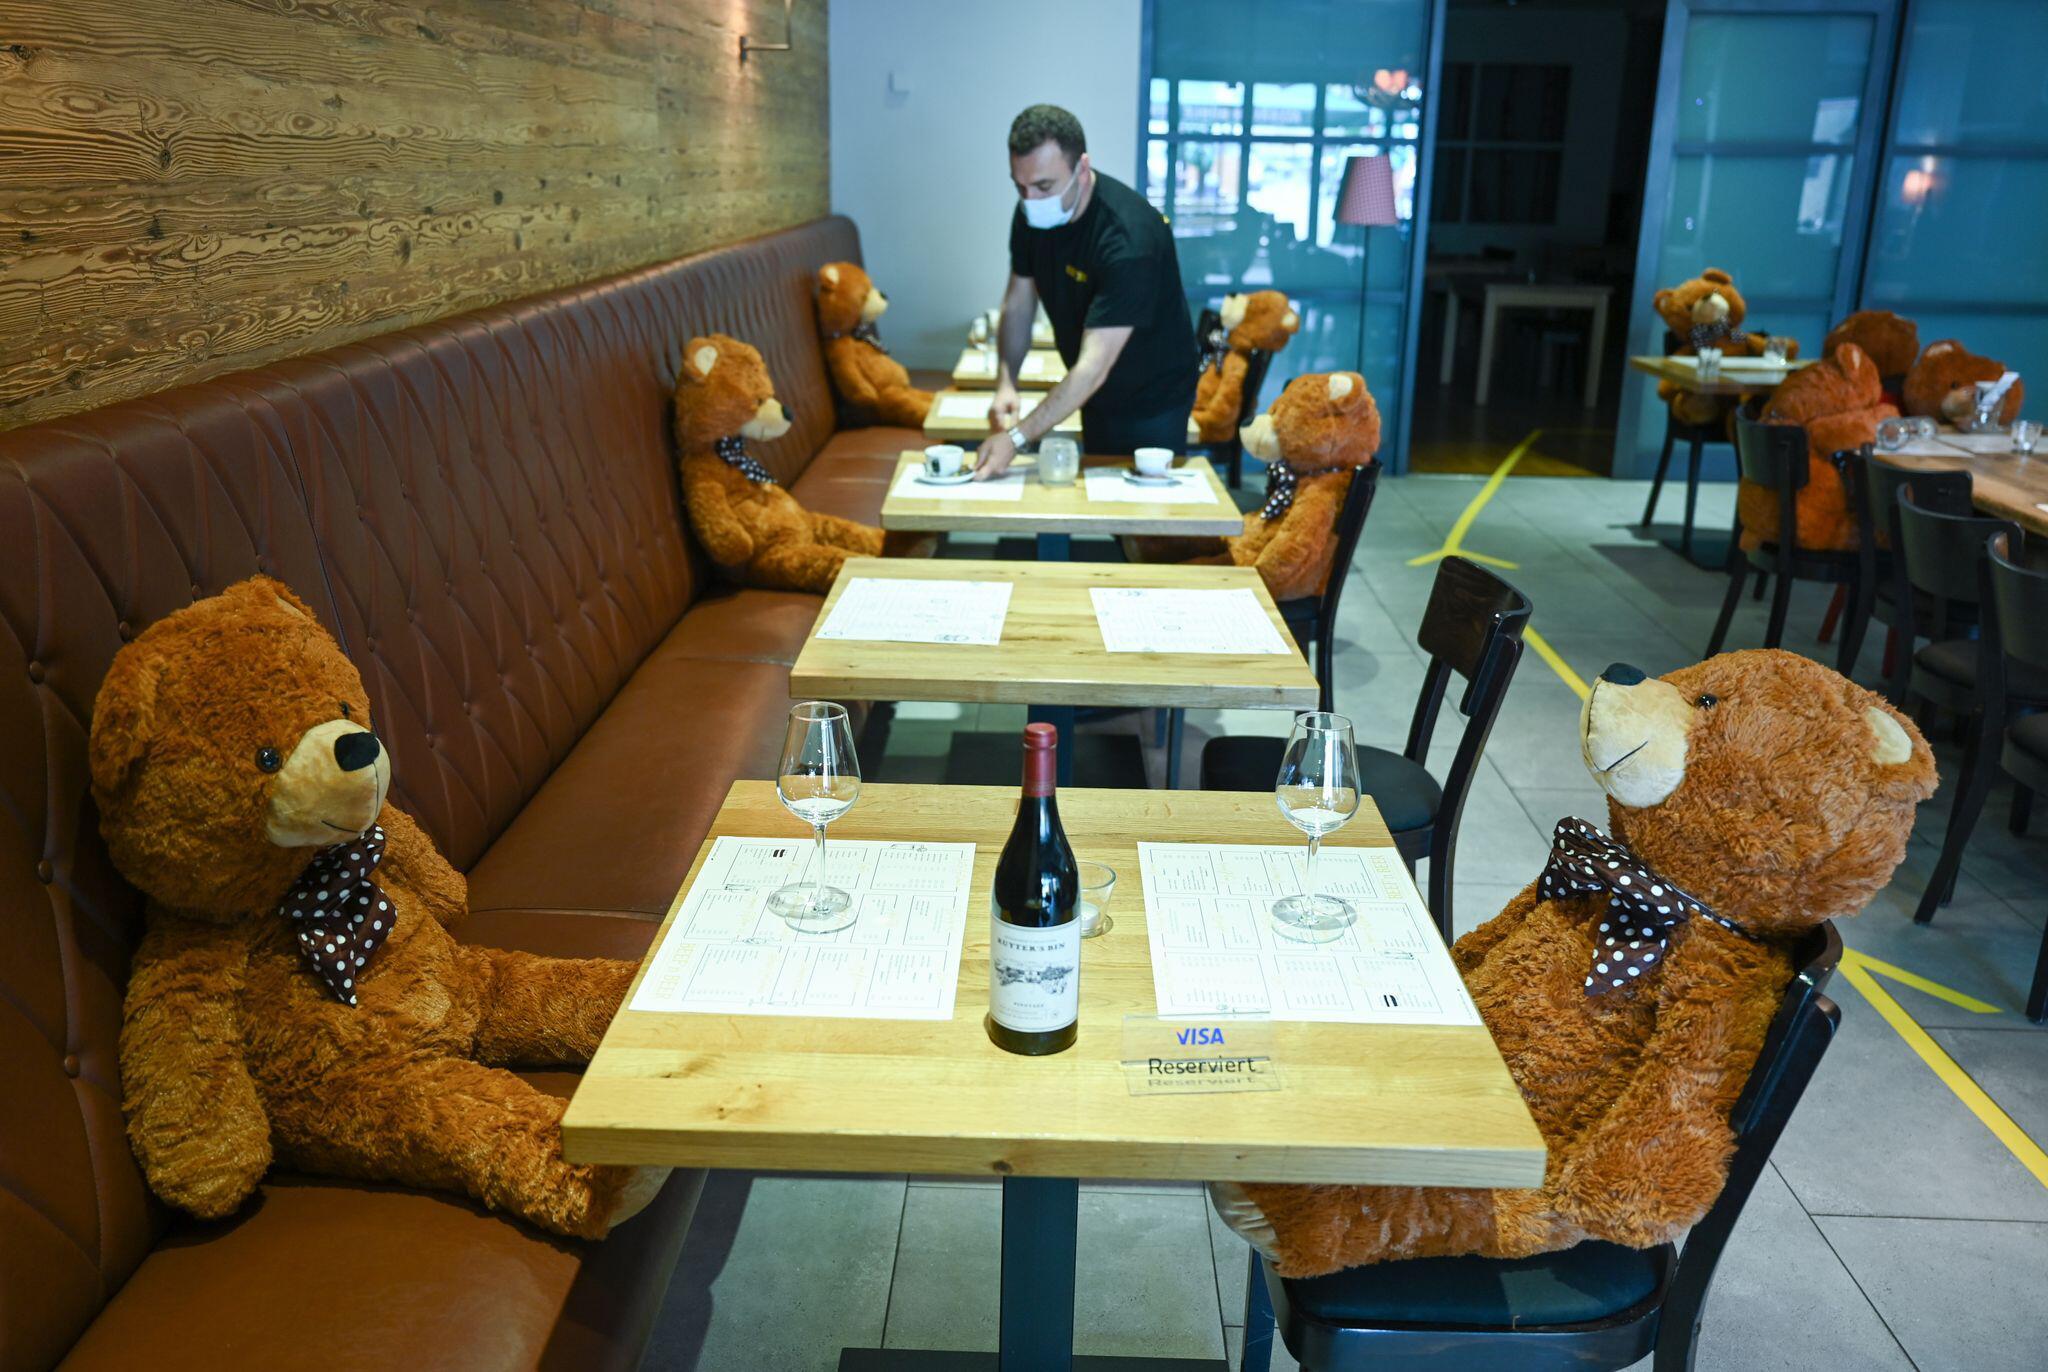 Bild zu Coronavirus - Restaurant in Hofheim